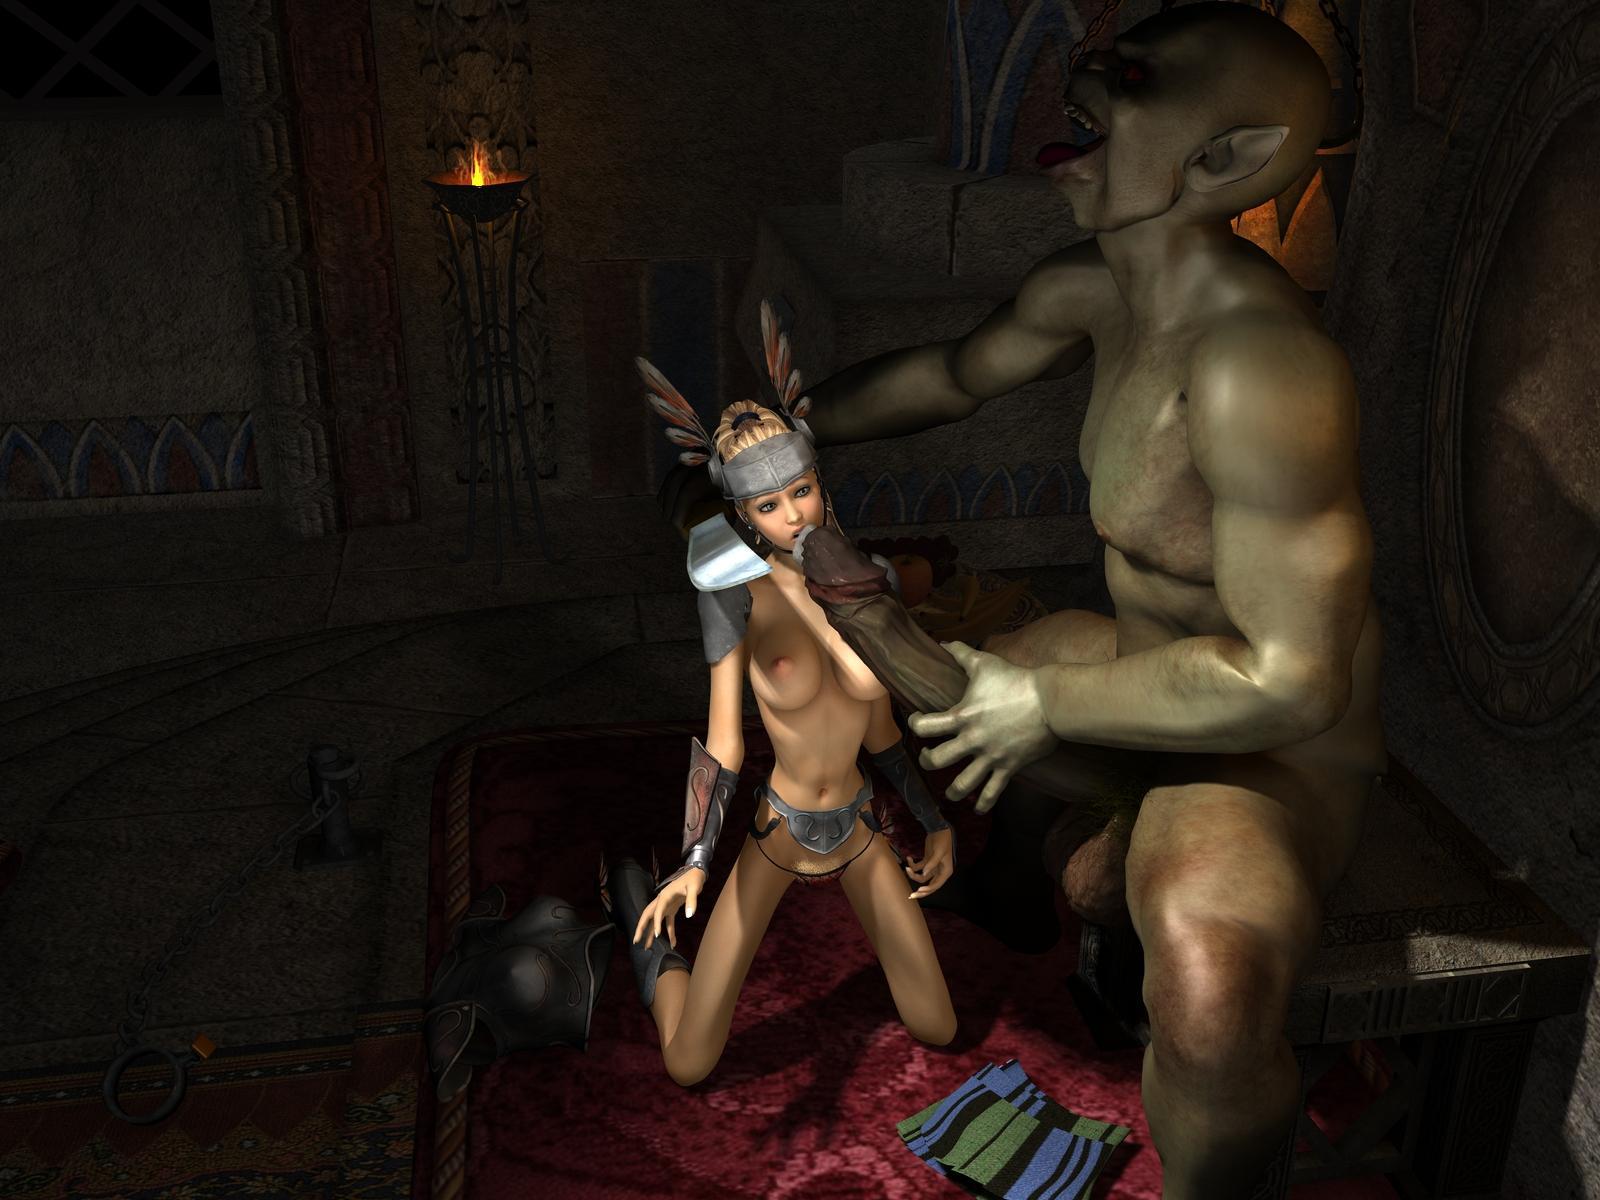 Orcs vs dark elf porn vid full  pron pic